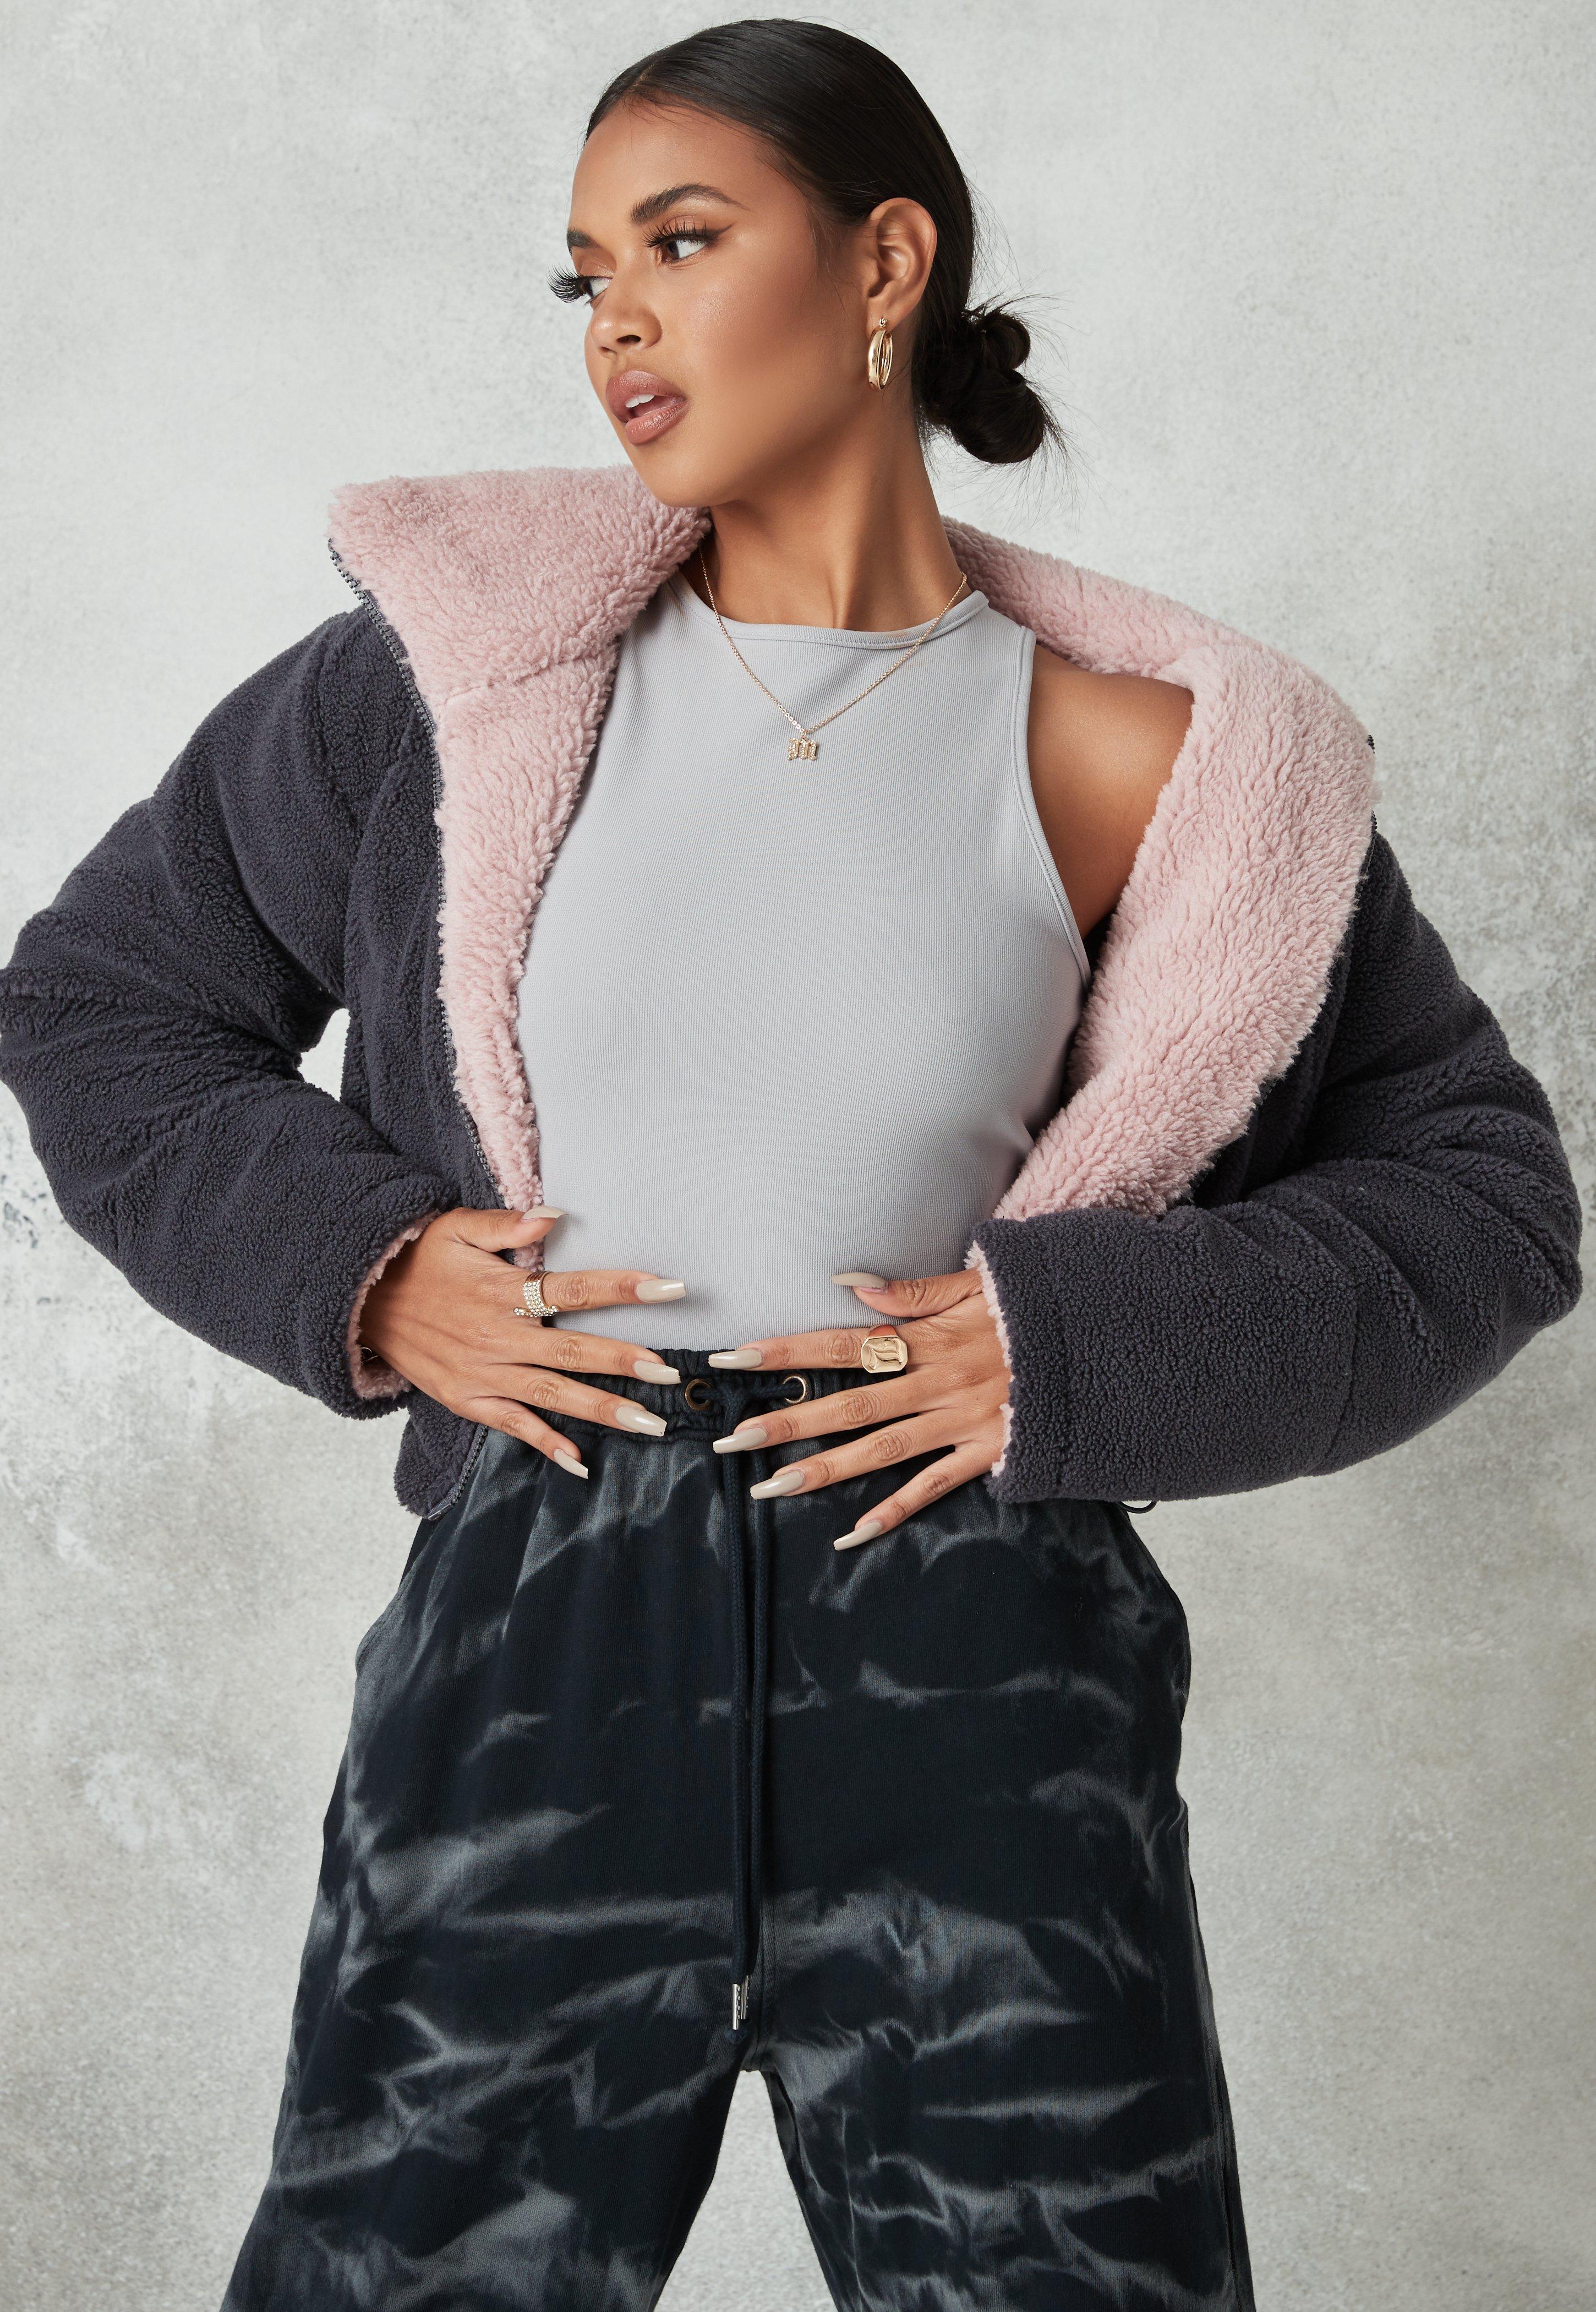 Fab pastel baby pink fur coat teddy bear jacket over Depop